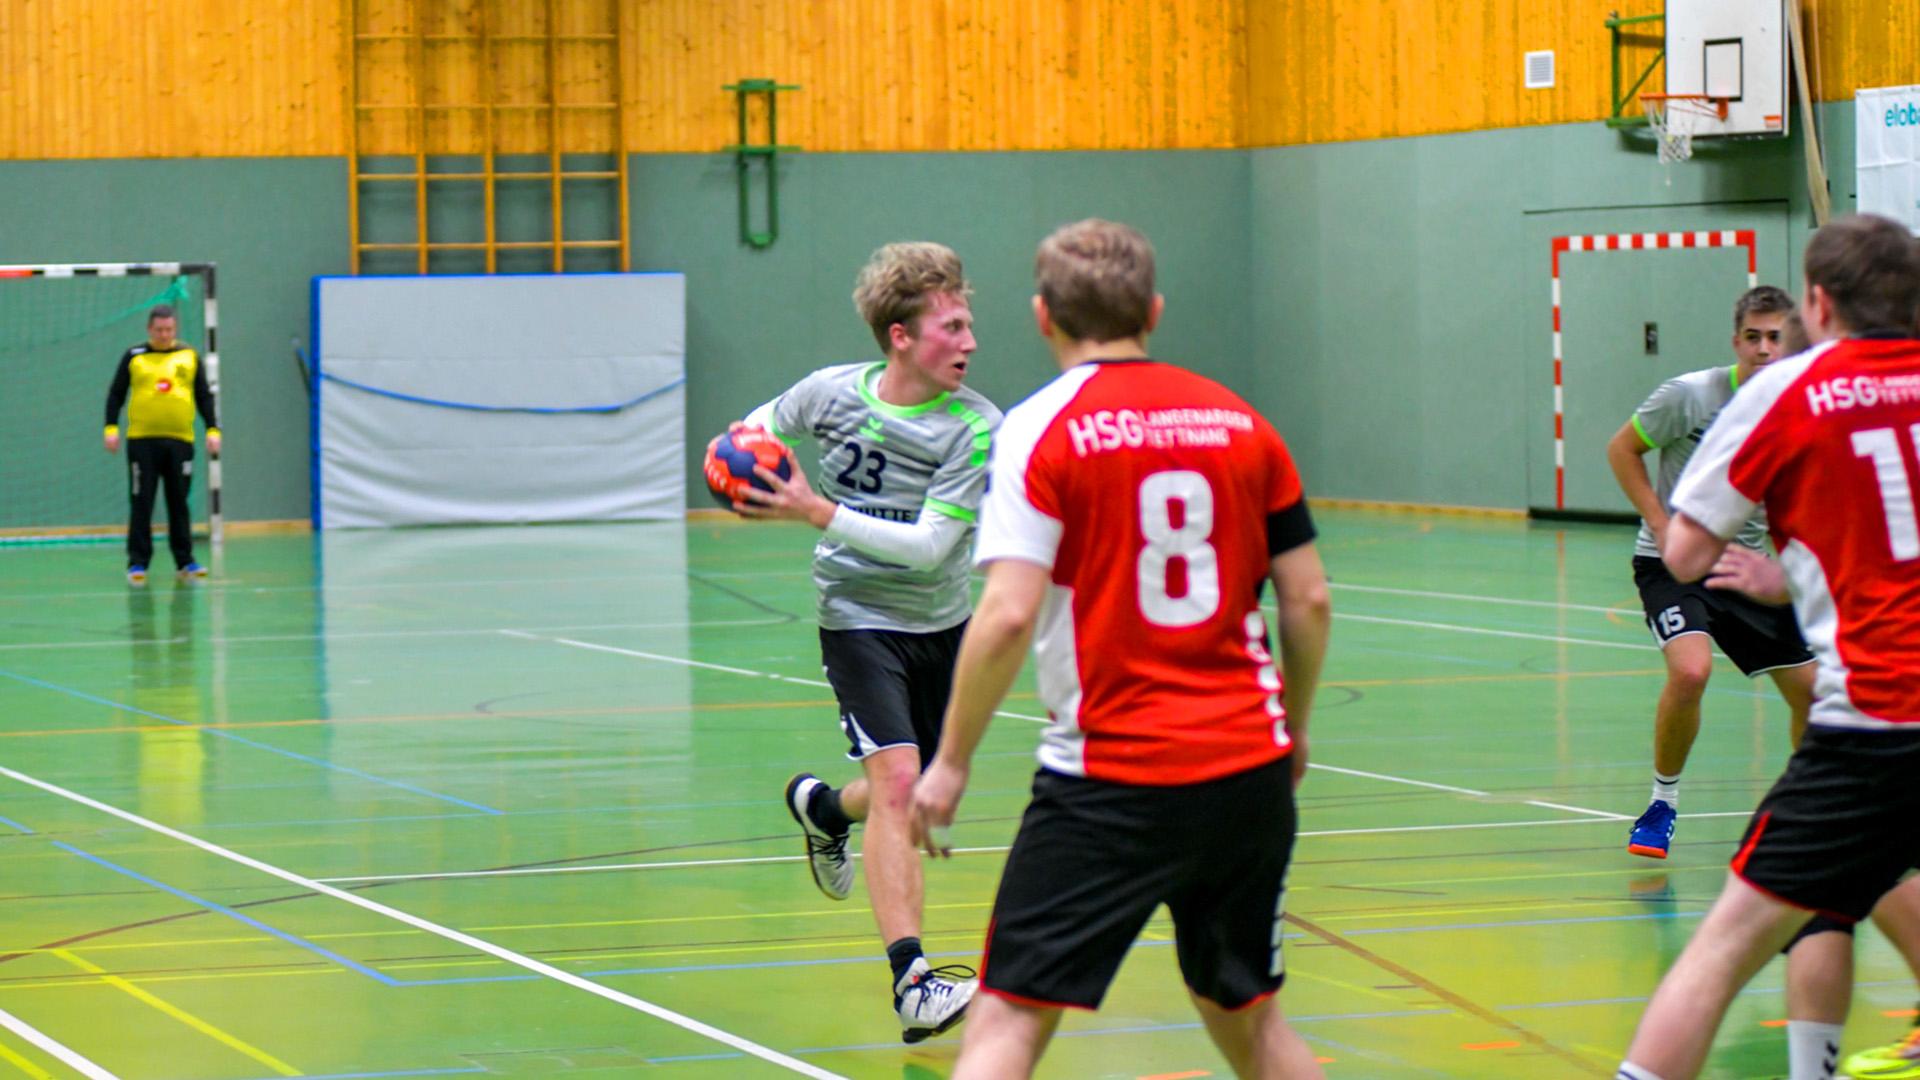 074Slider_Herren2_tsg_leutkirch_handball